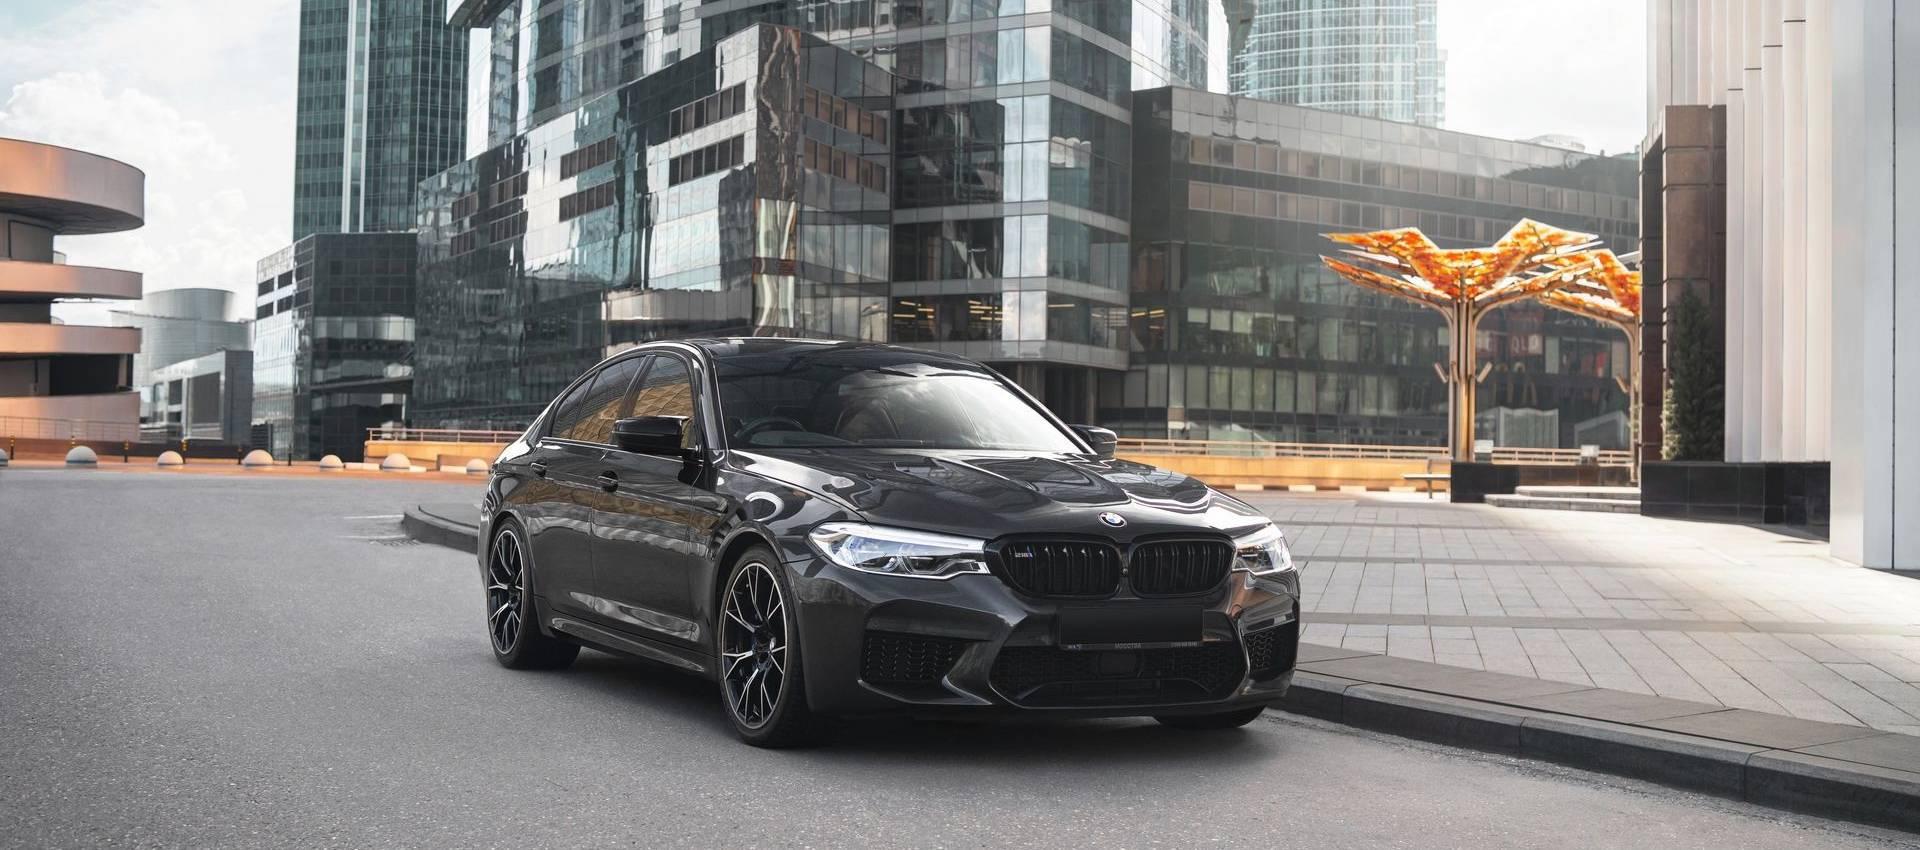 Аренда BMW M5 Competition в Москве